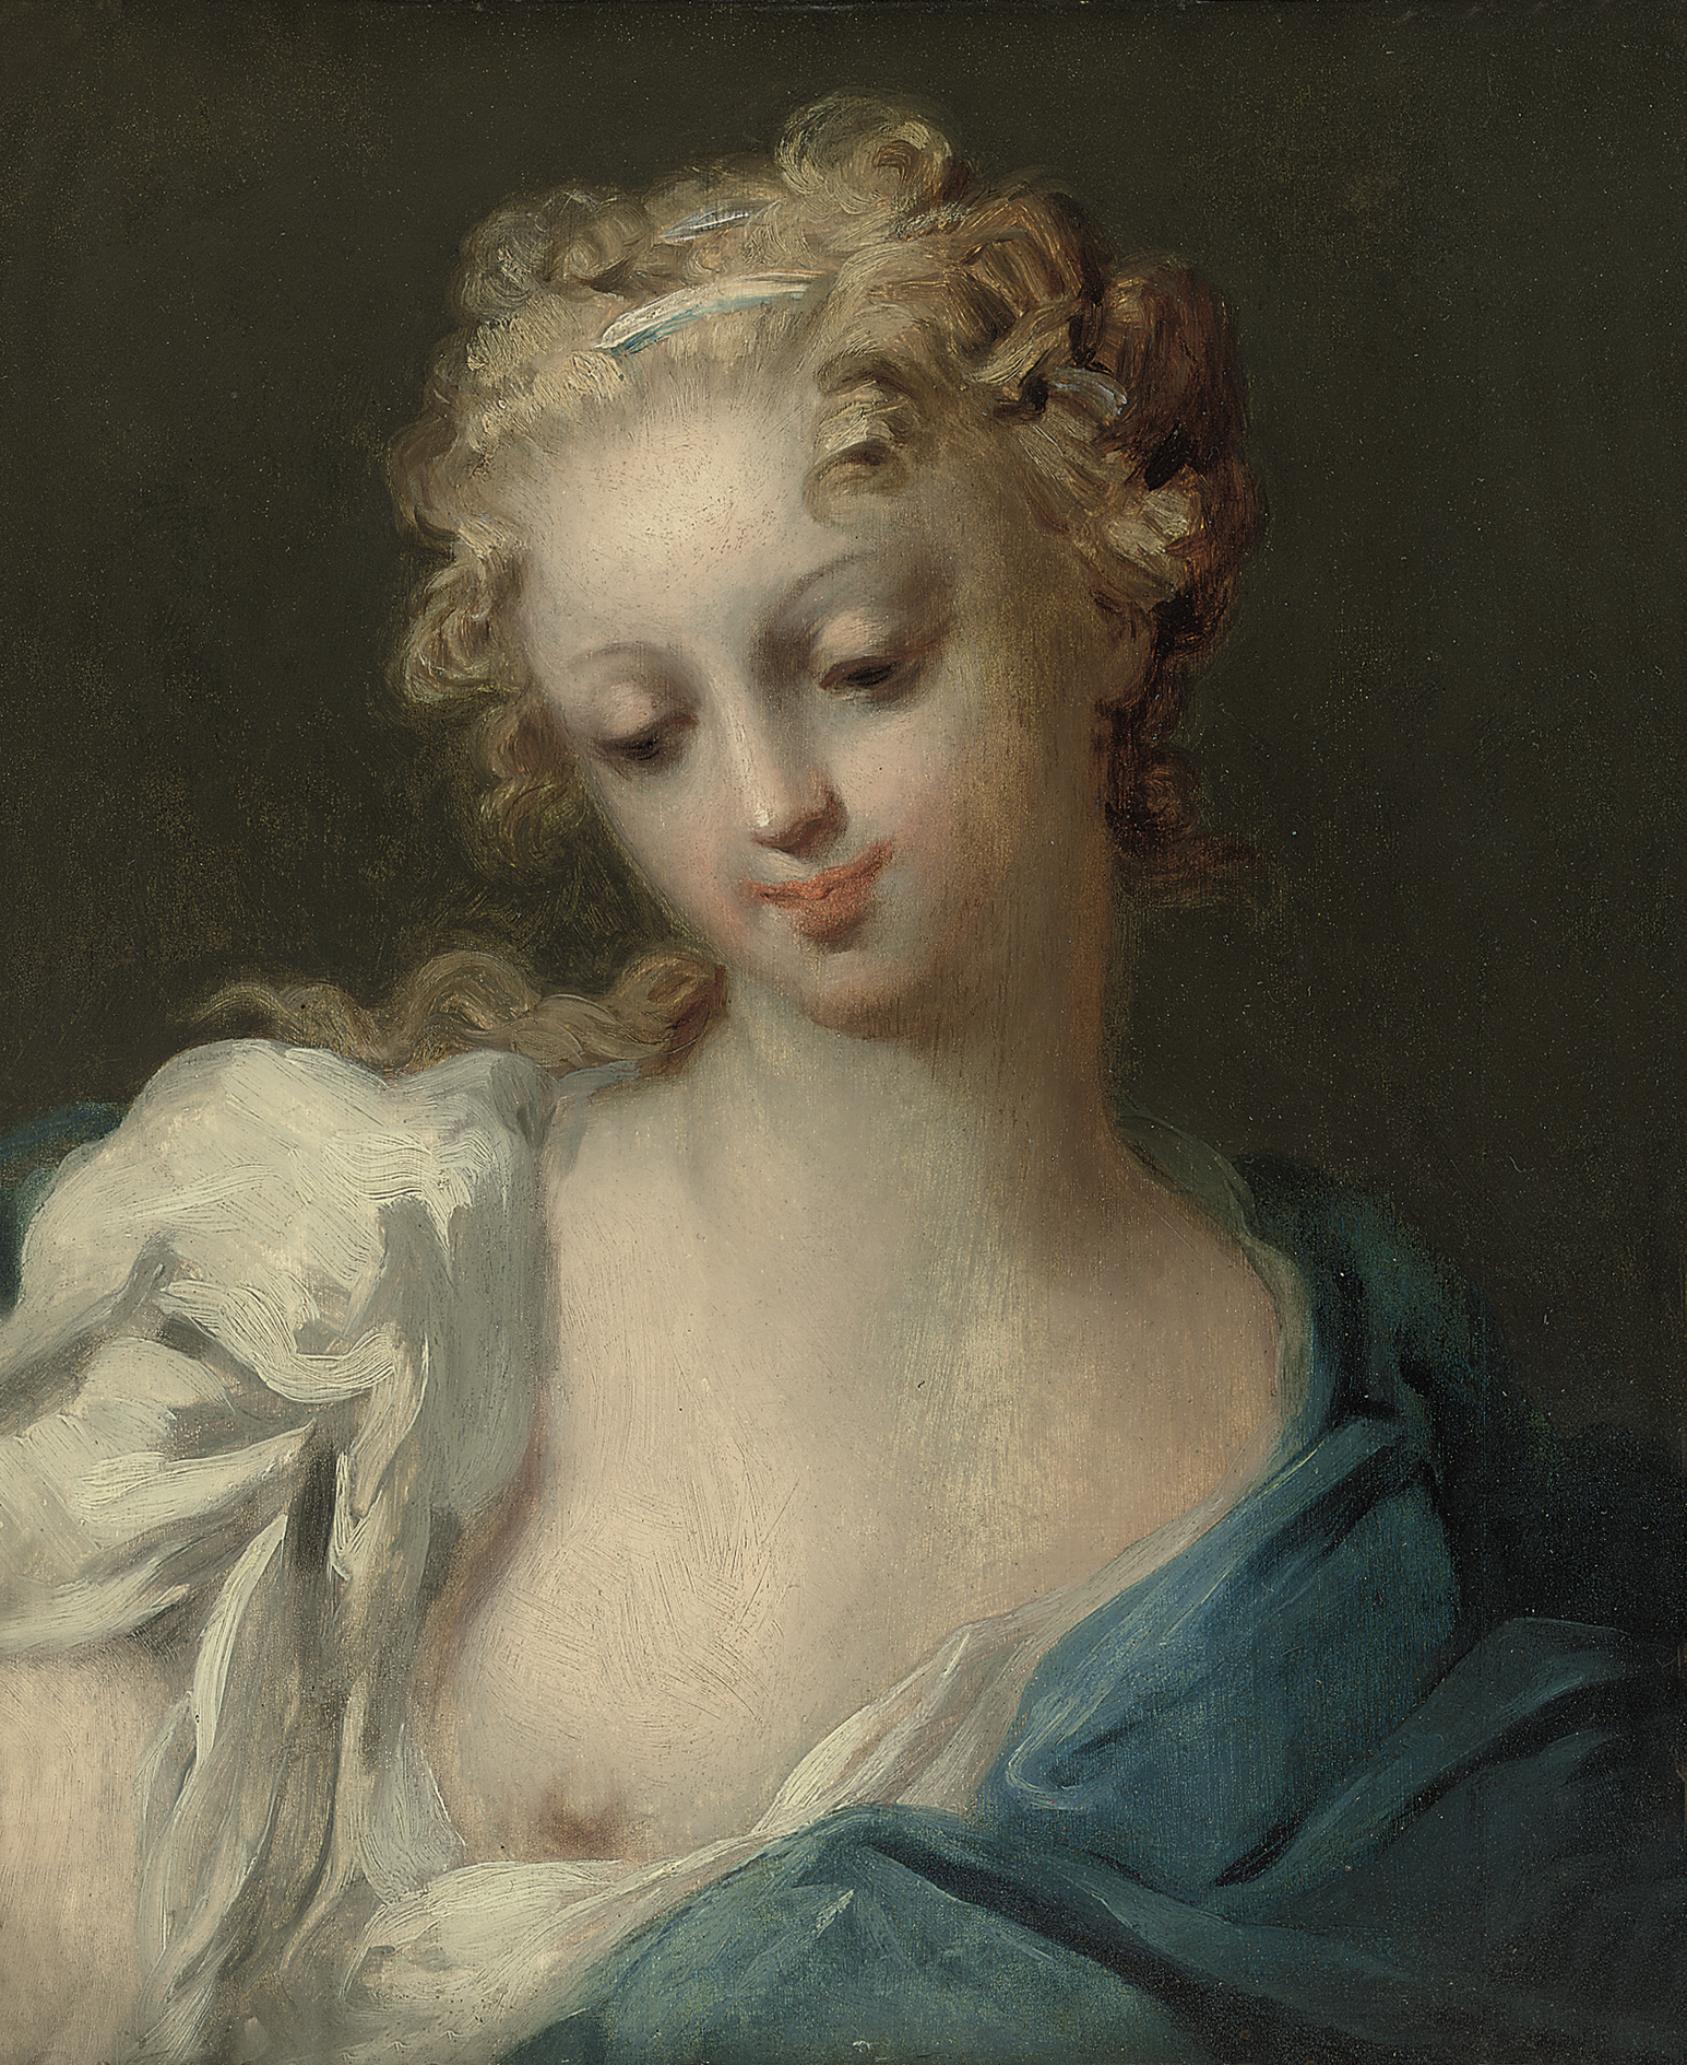 Sketch of a lady en déshabillé in a white chemise and blue wrap